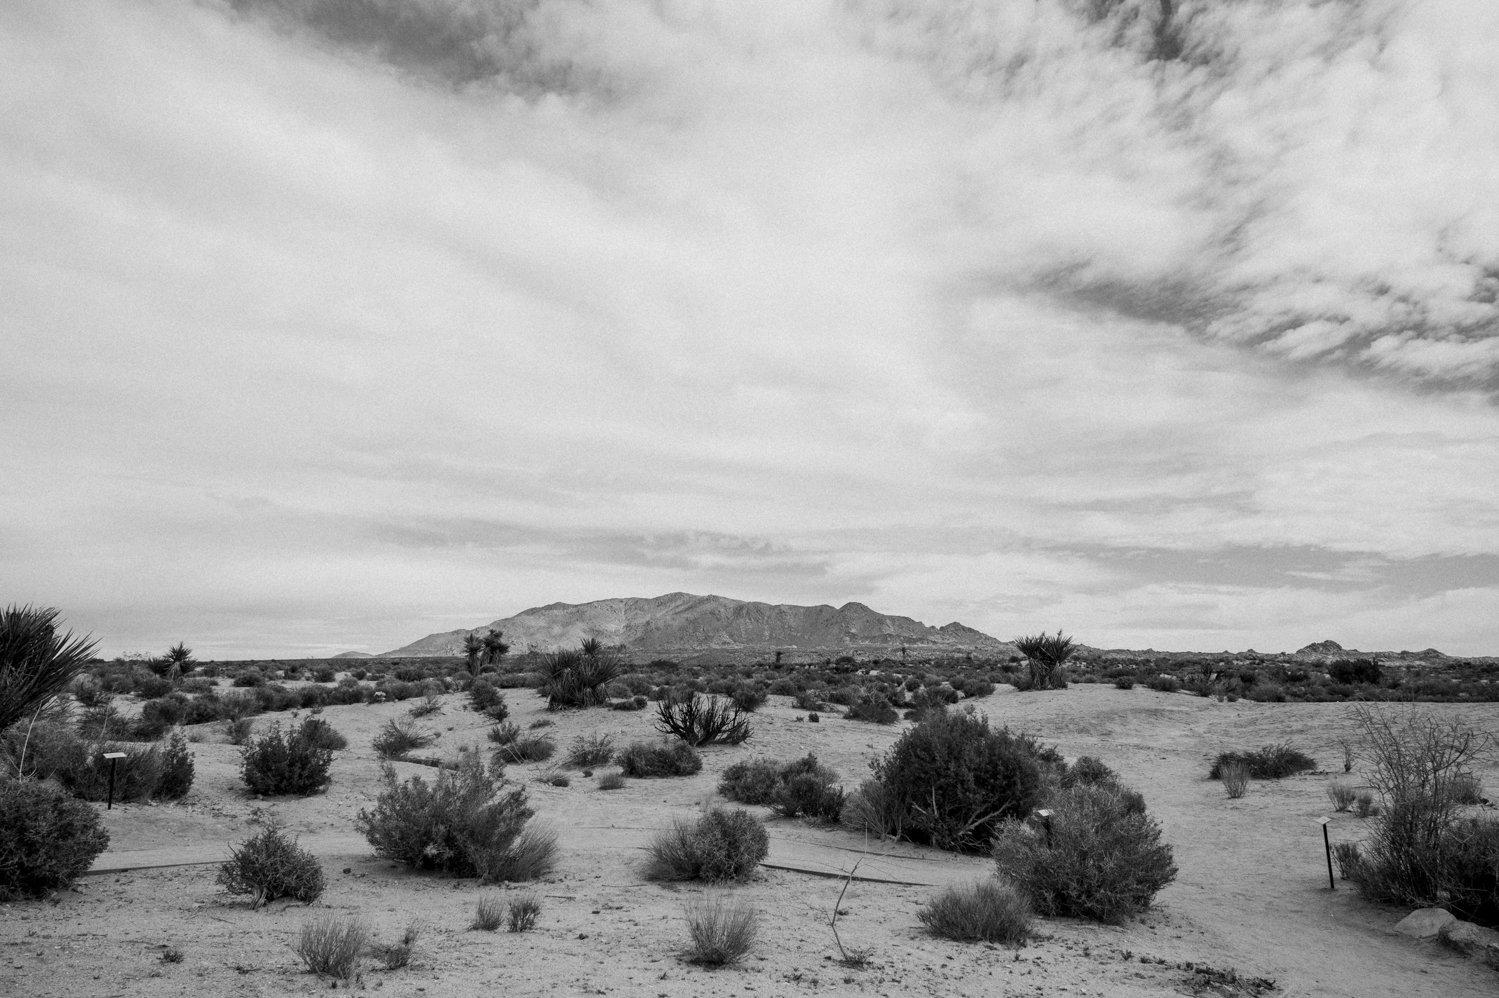 USA ROADTRIP TRAVEL PHOTOGRAPHY-228